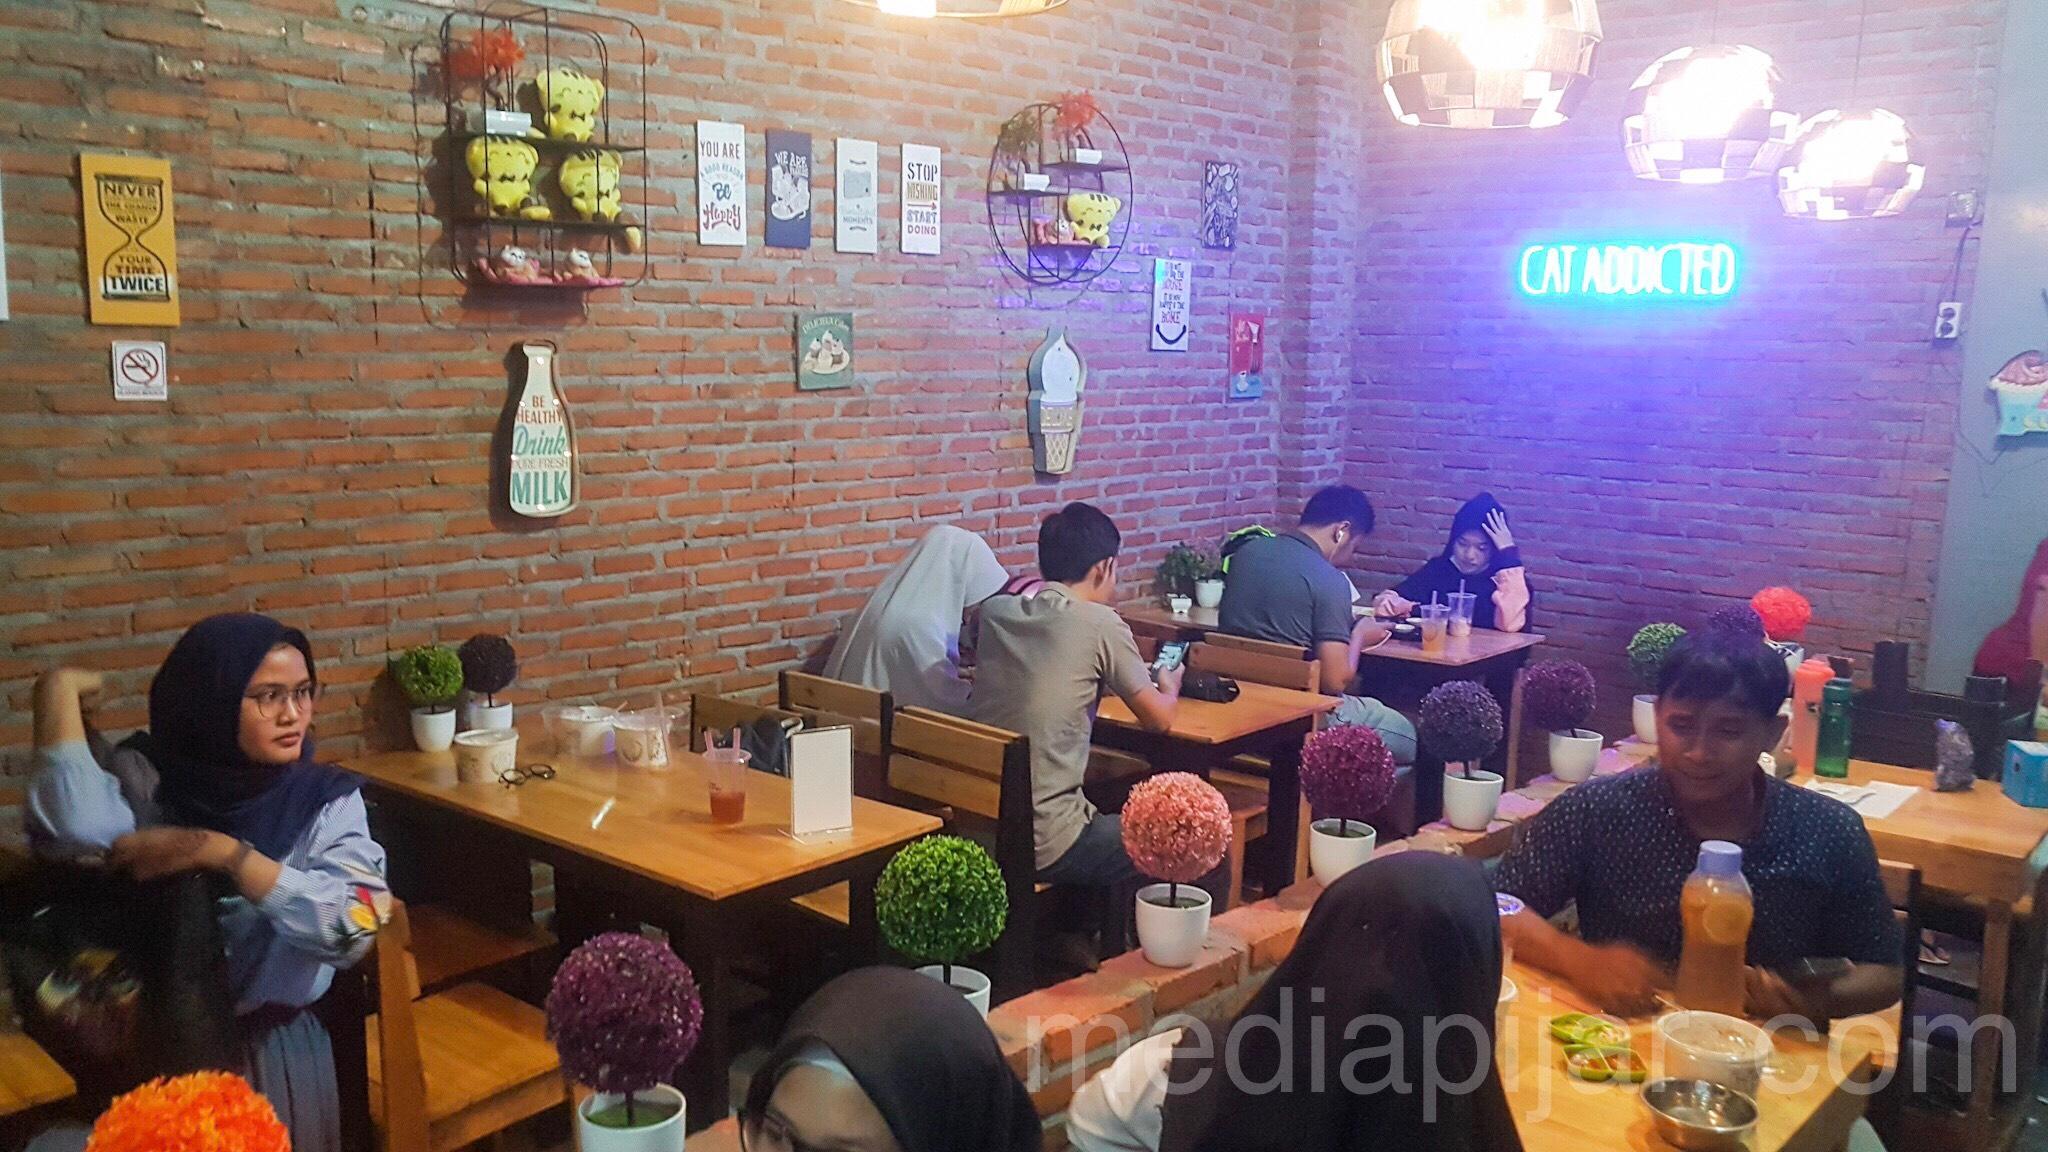 Nuansa Tempat makan yang menarik di Cat Cafe Fotografer: Dwi Harizki